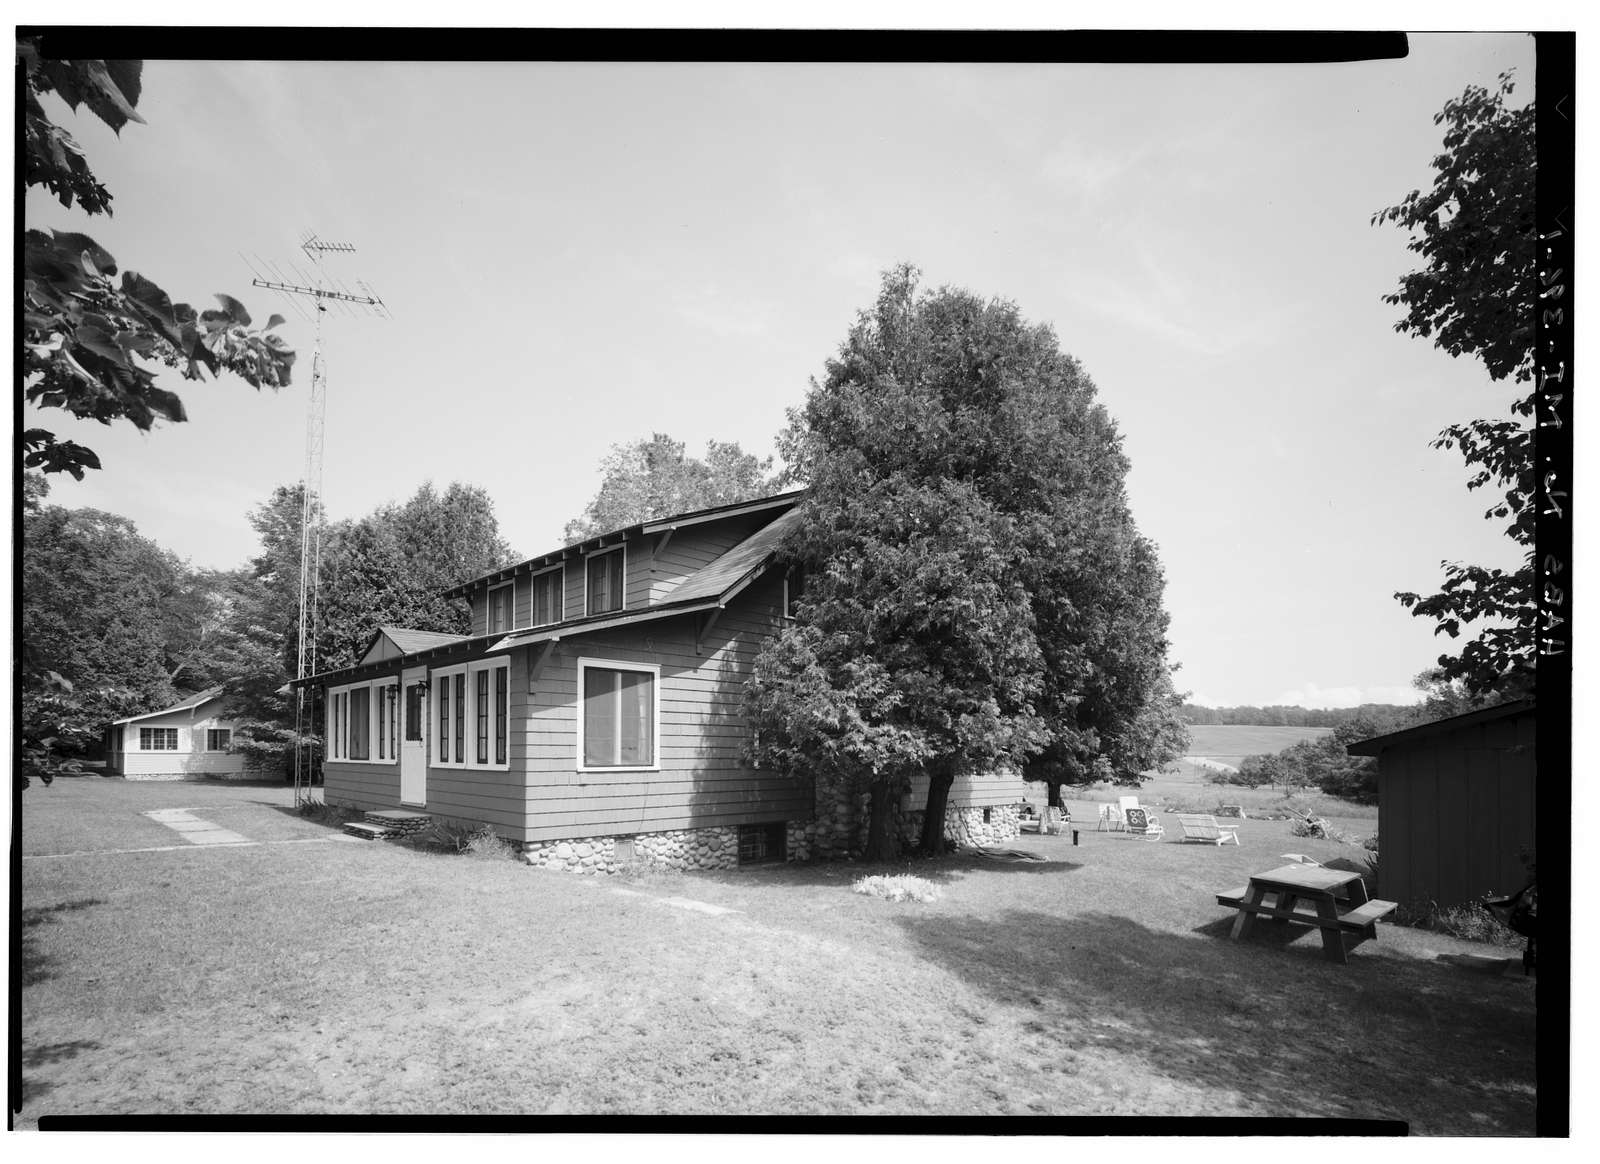 Fred Miller Farm, Thorsen Road, Glen Arbor, Leelanau County, MI